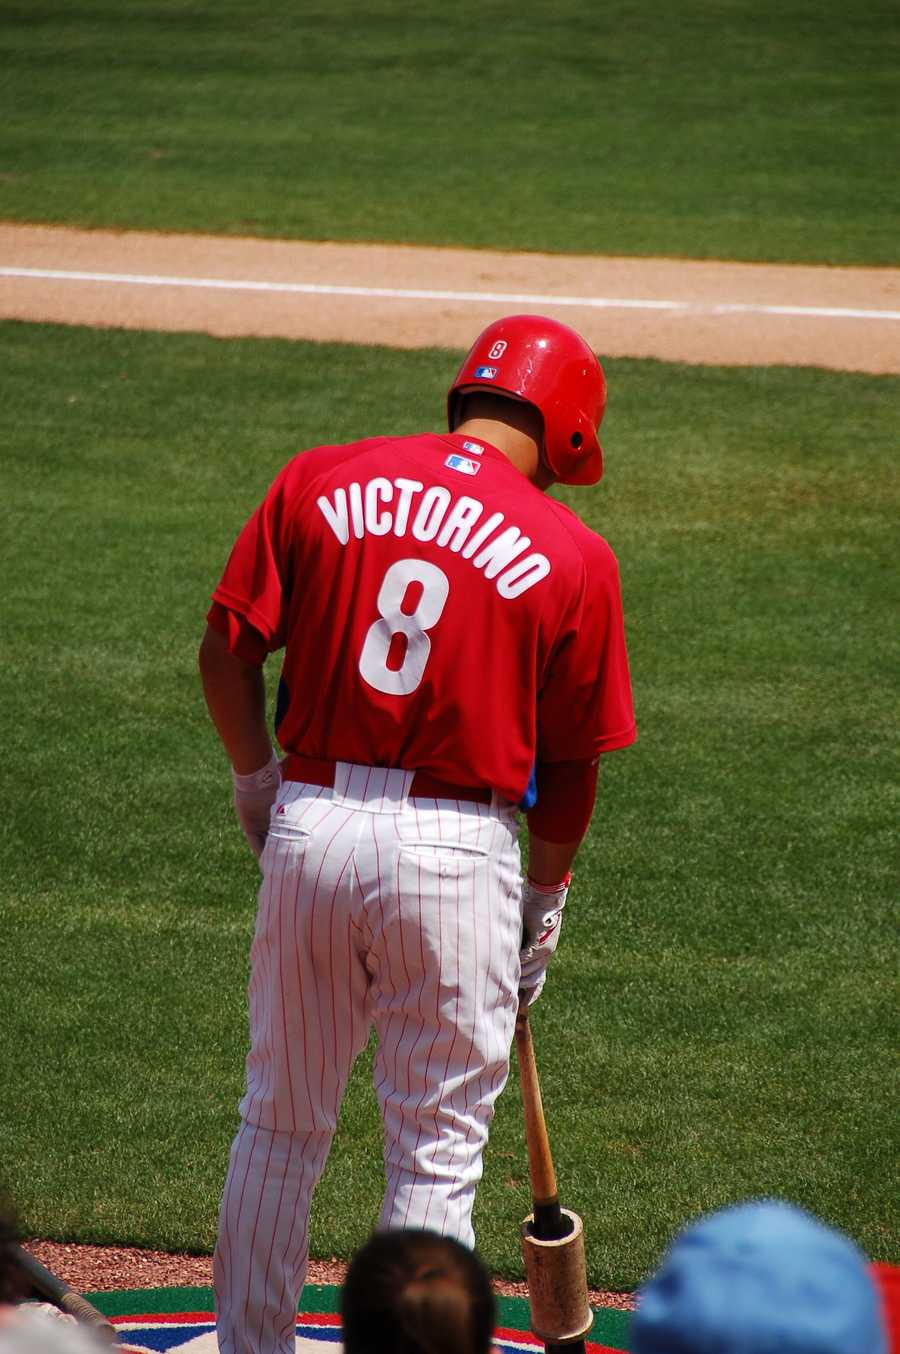 Shane Victorino (OF) - $13 million